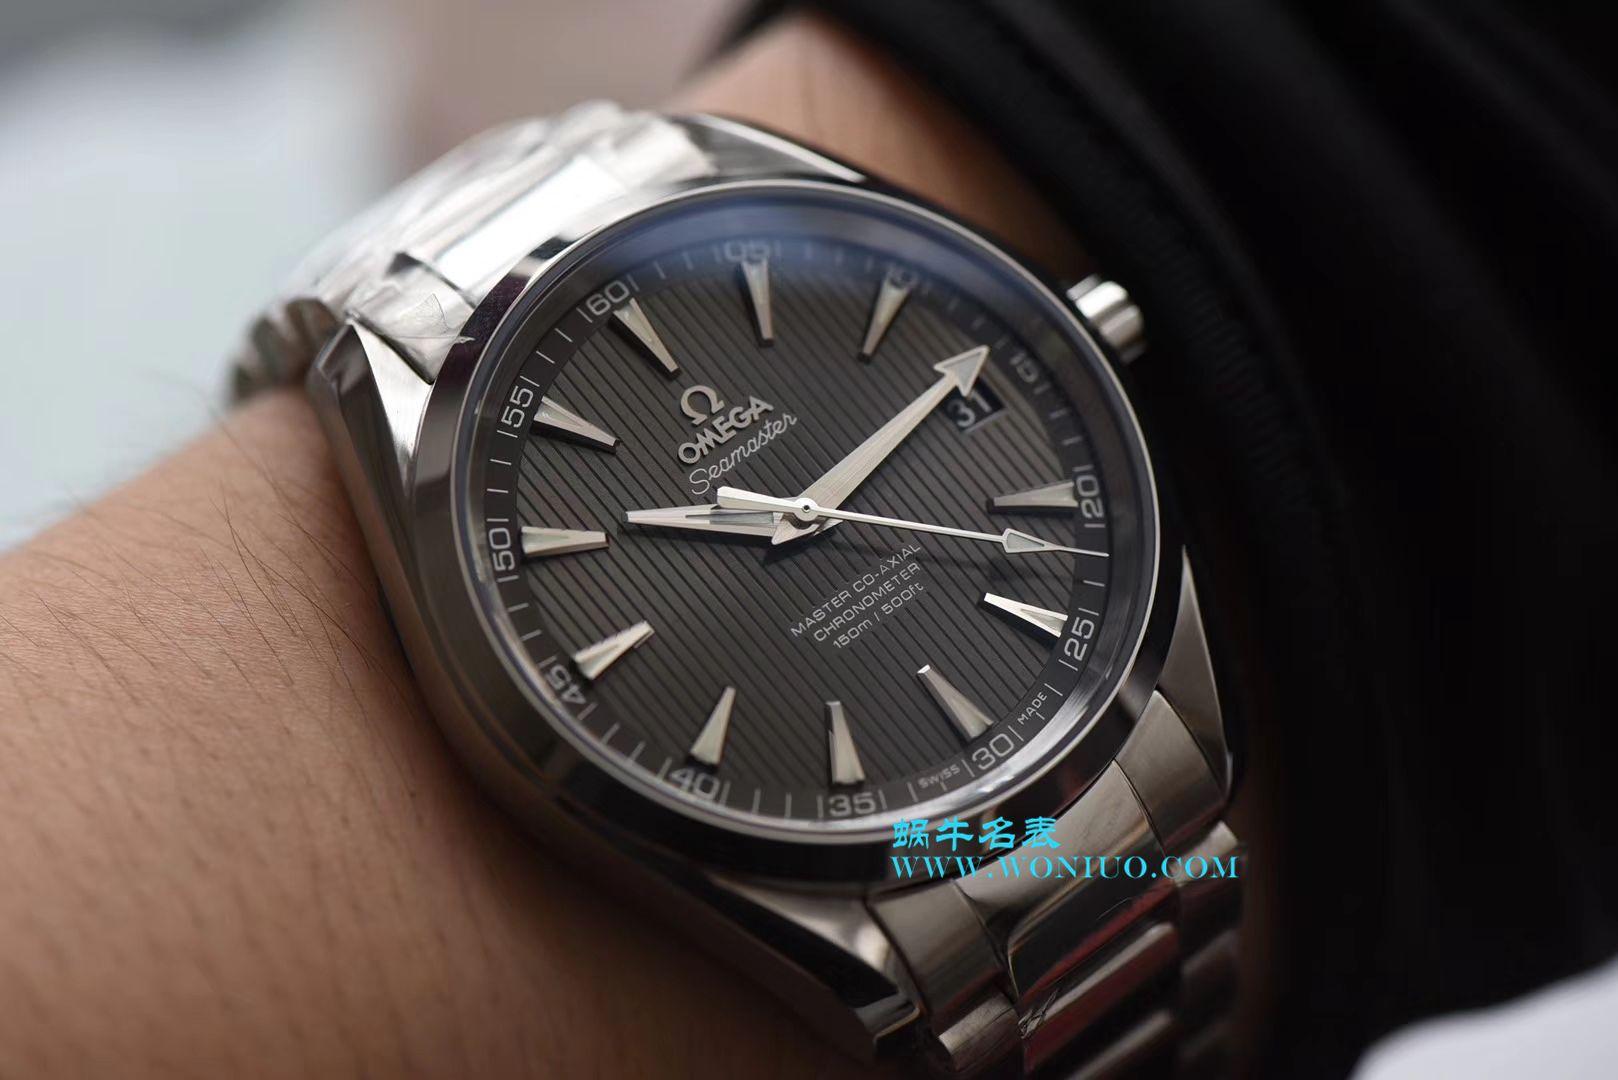 【VS厂一比一超A复刻手表】欧米茄海马系列231.10.42.21.01.003腕表 / M351